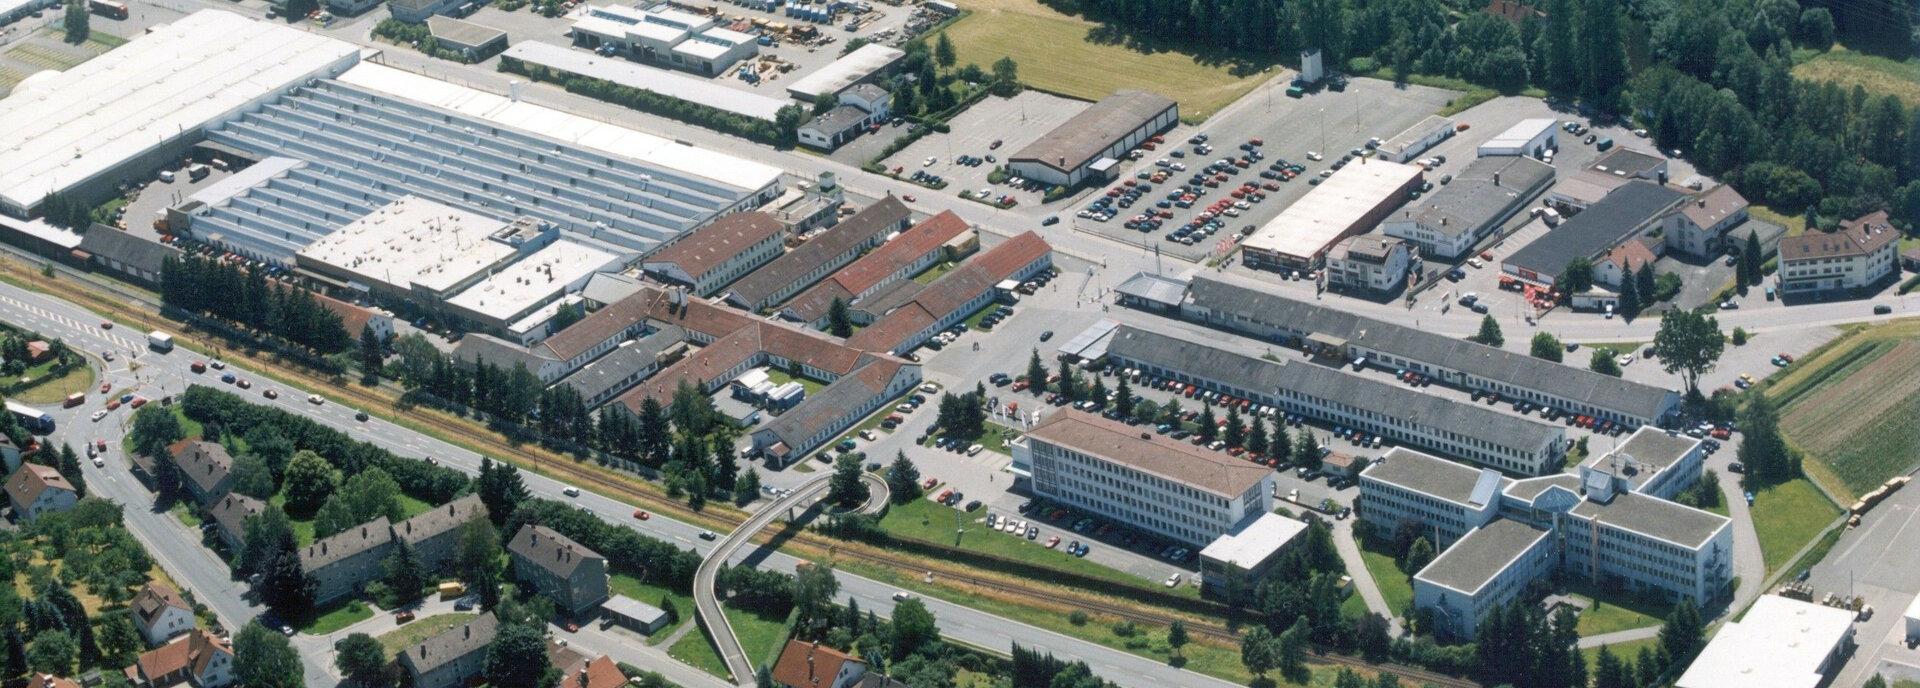 Loewe-Fertigung in Kronach